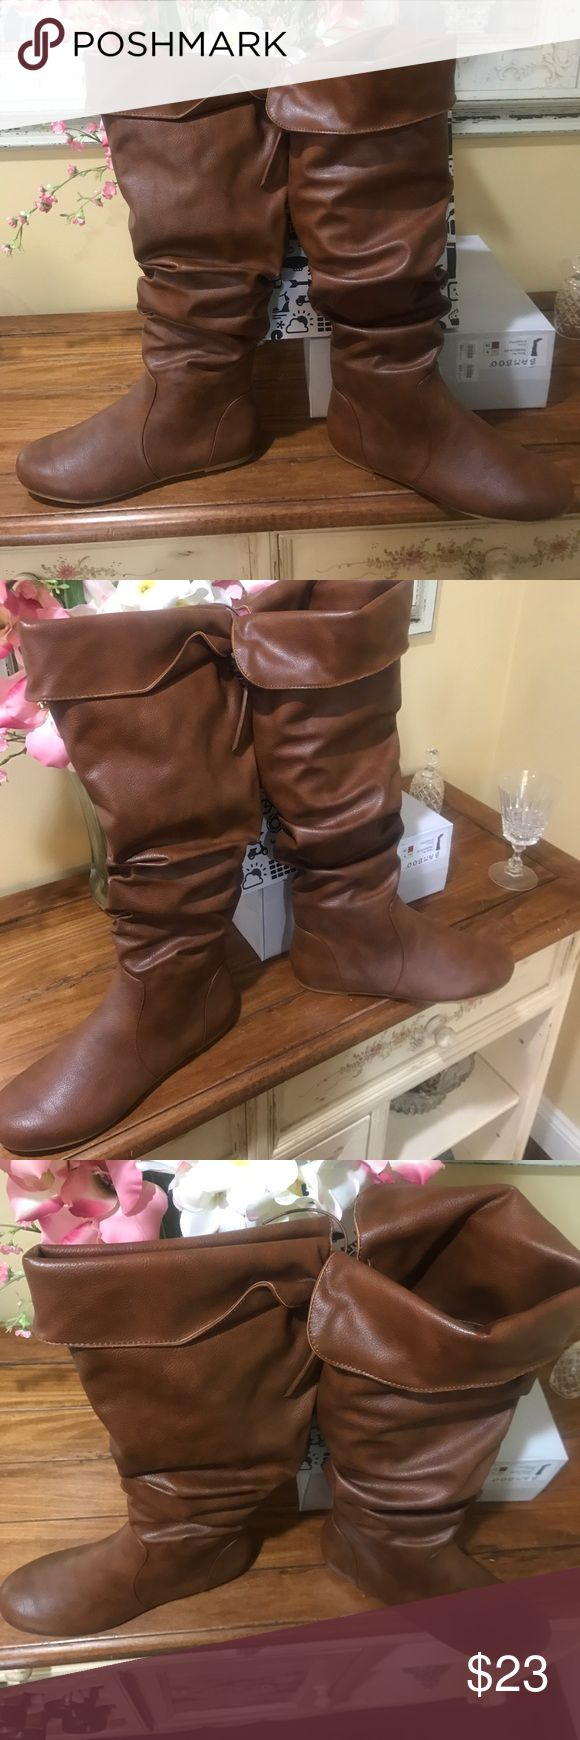 NIB slouchy boots Cute slouchy boot NIB Charlotte Russe Shoes